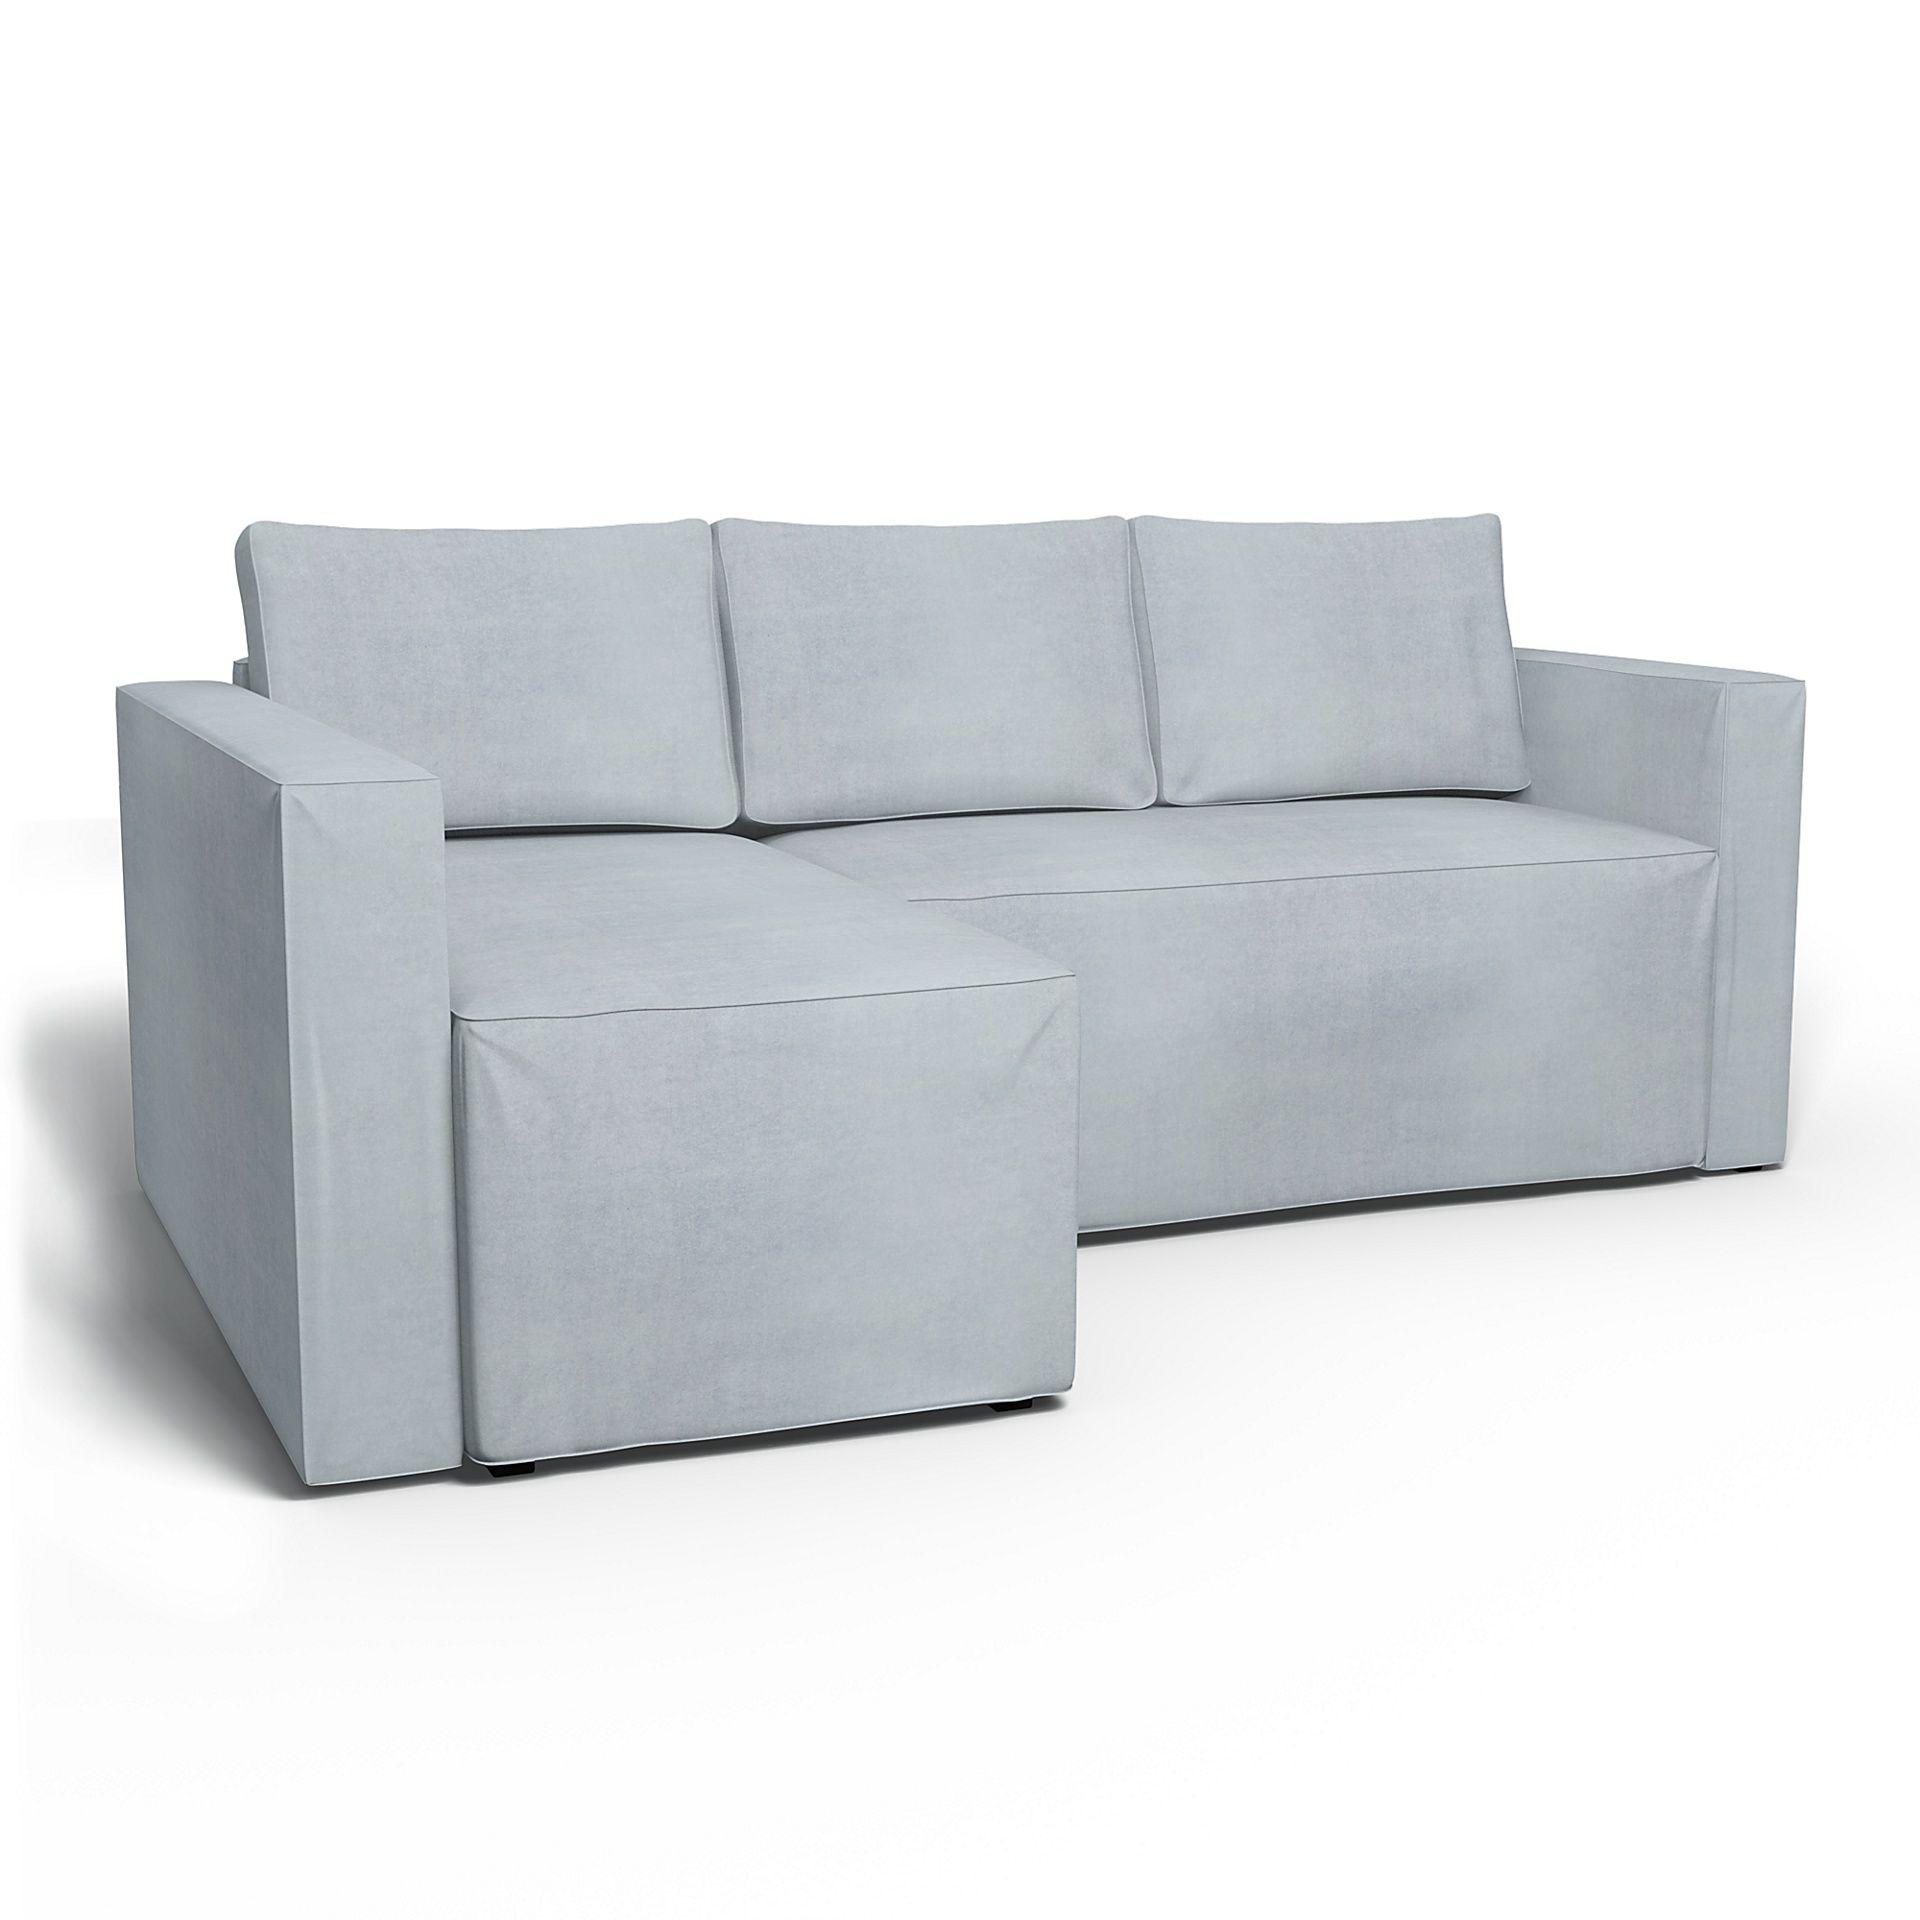 Ikea Månstad, Corner Sofa Bed With Storage, Left – Bemz Inside Manstad Sofas (View 2 of 15)